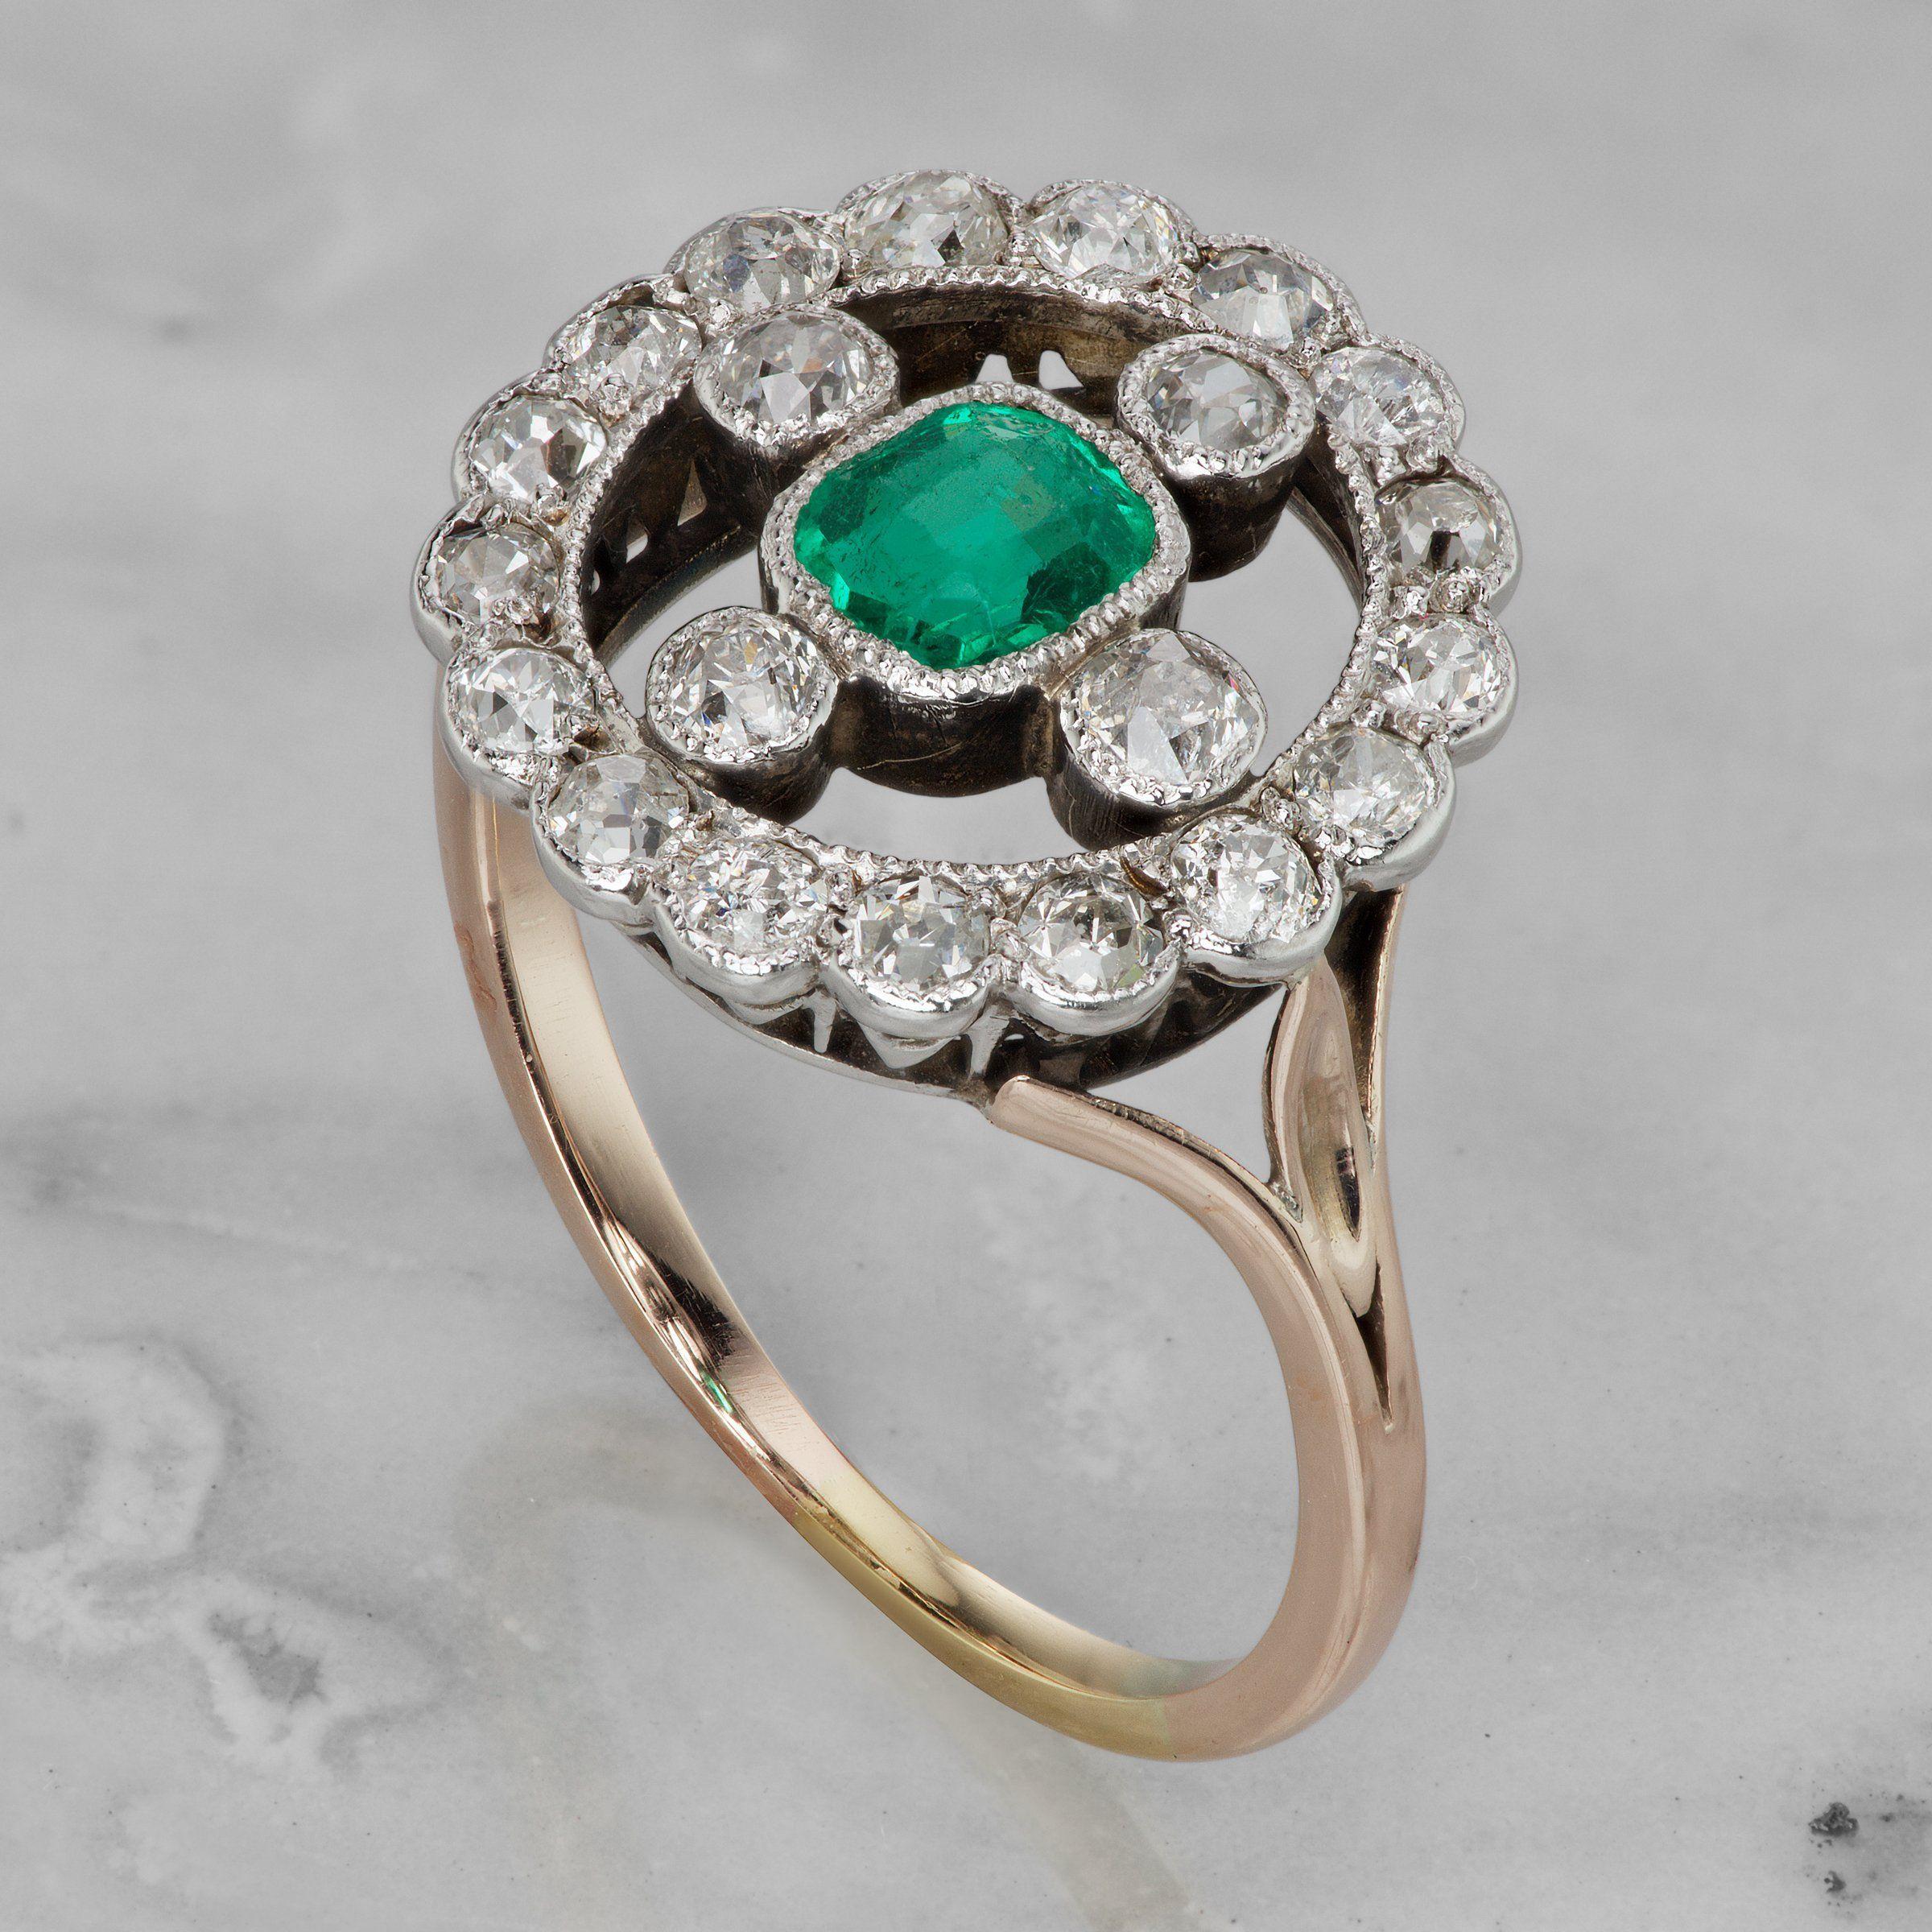 Fantastisch Diamantdraht Ohrringe Fotos - Verdrahtungsideen - korsmi ...